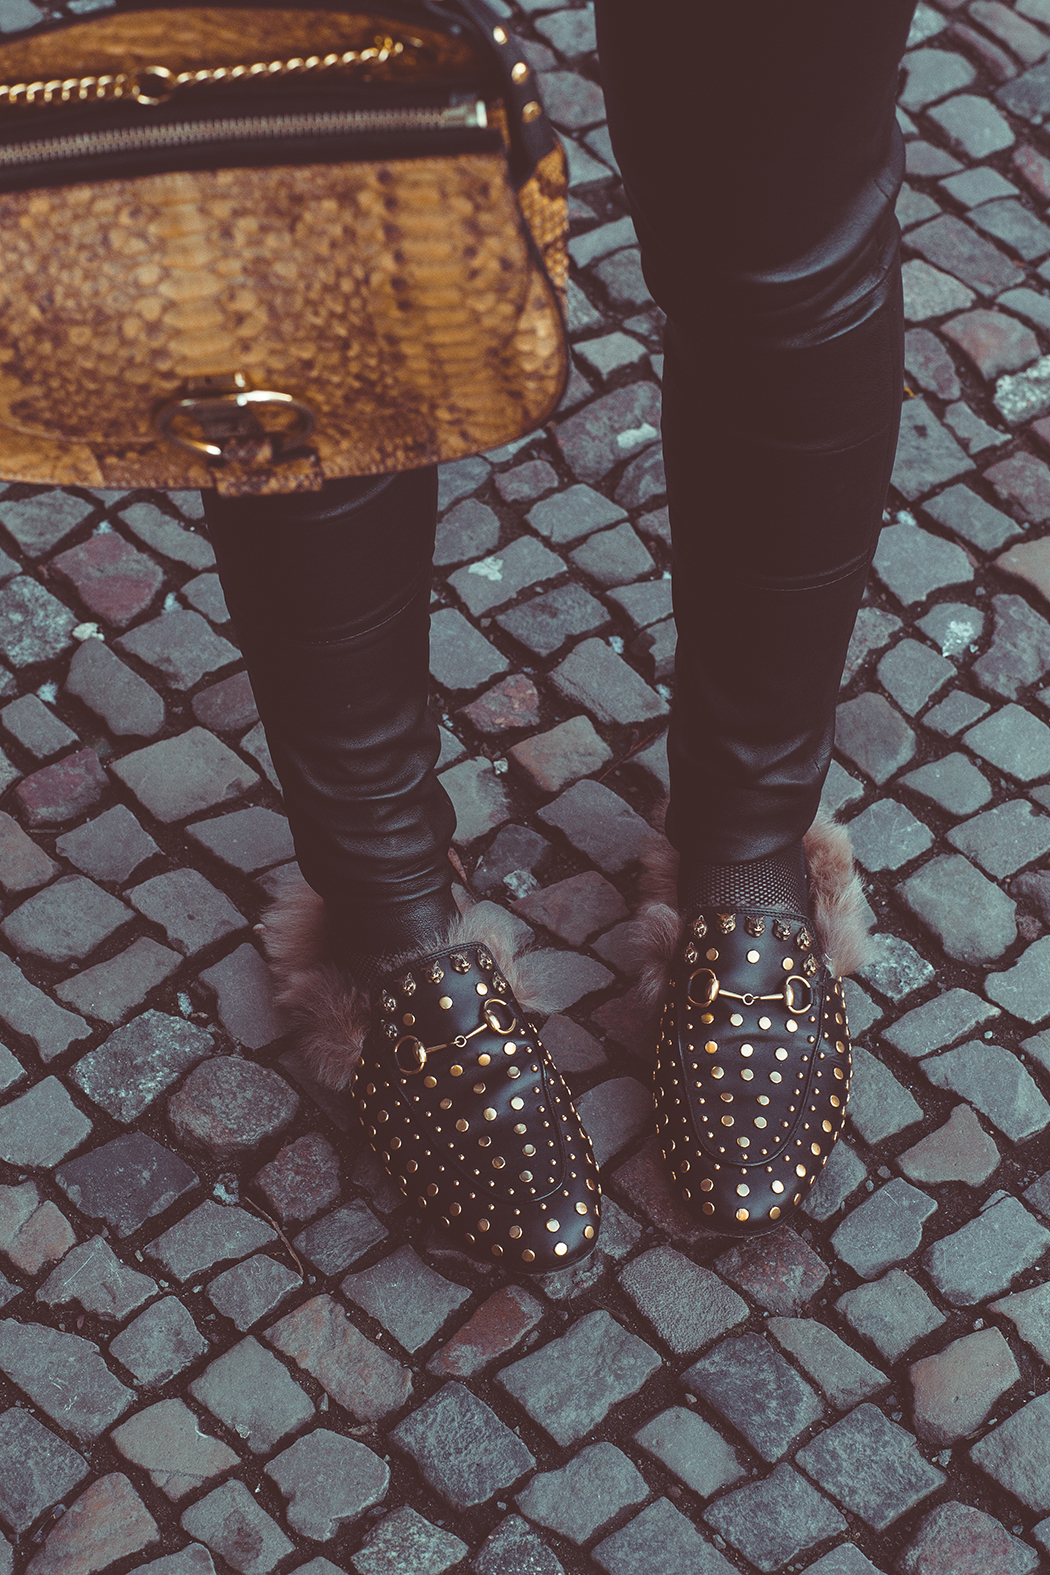 Fashionblog-Fashionblogger-Fashion-Blog-Blogger-Fashion-Week-Berlin-2017-Streetstyle-Lindarella-6-web